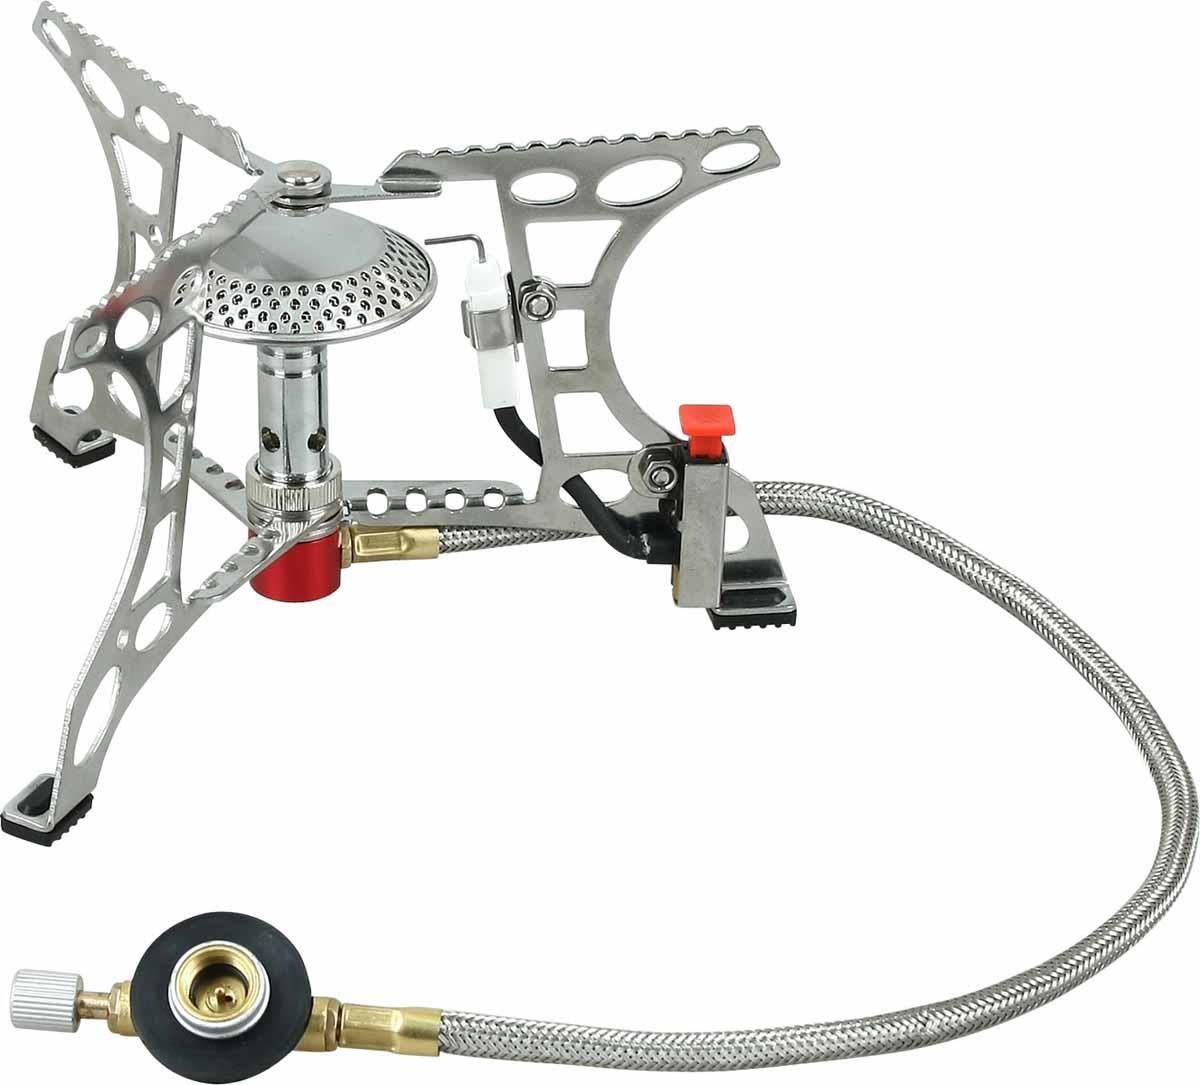 Горелка газовая Track Quick, с пьезоподжигом газовая горелка kovea ткв 9703 1l со шлангом